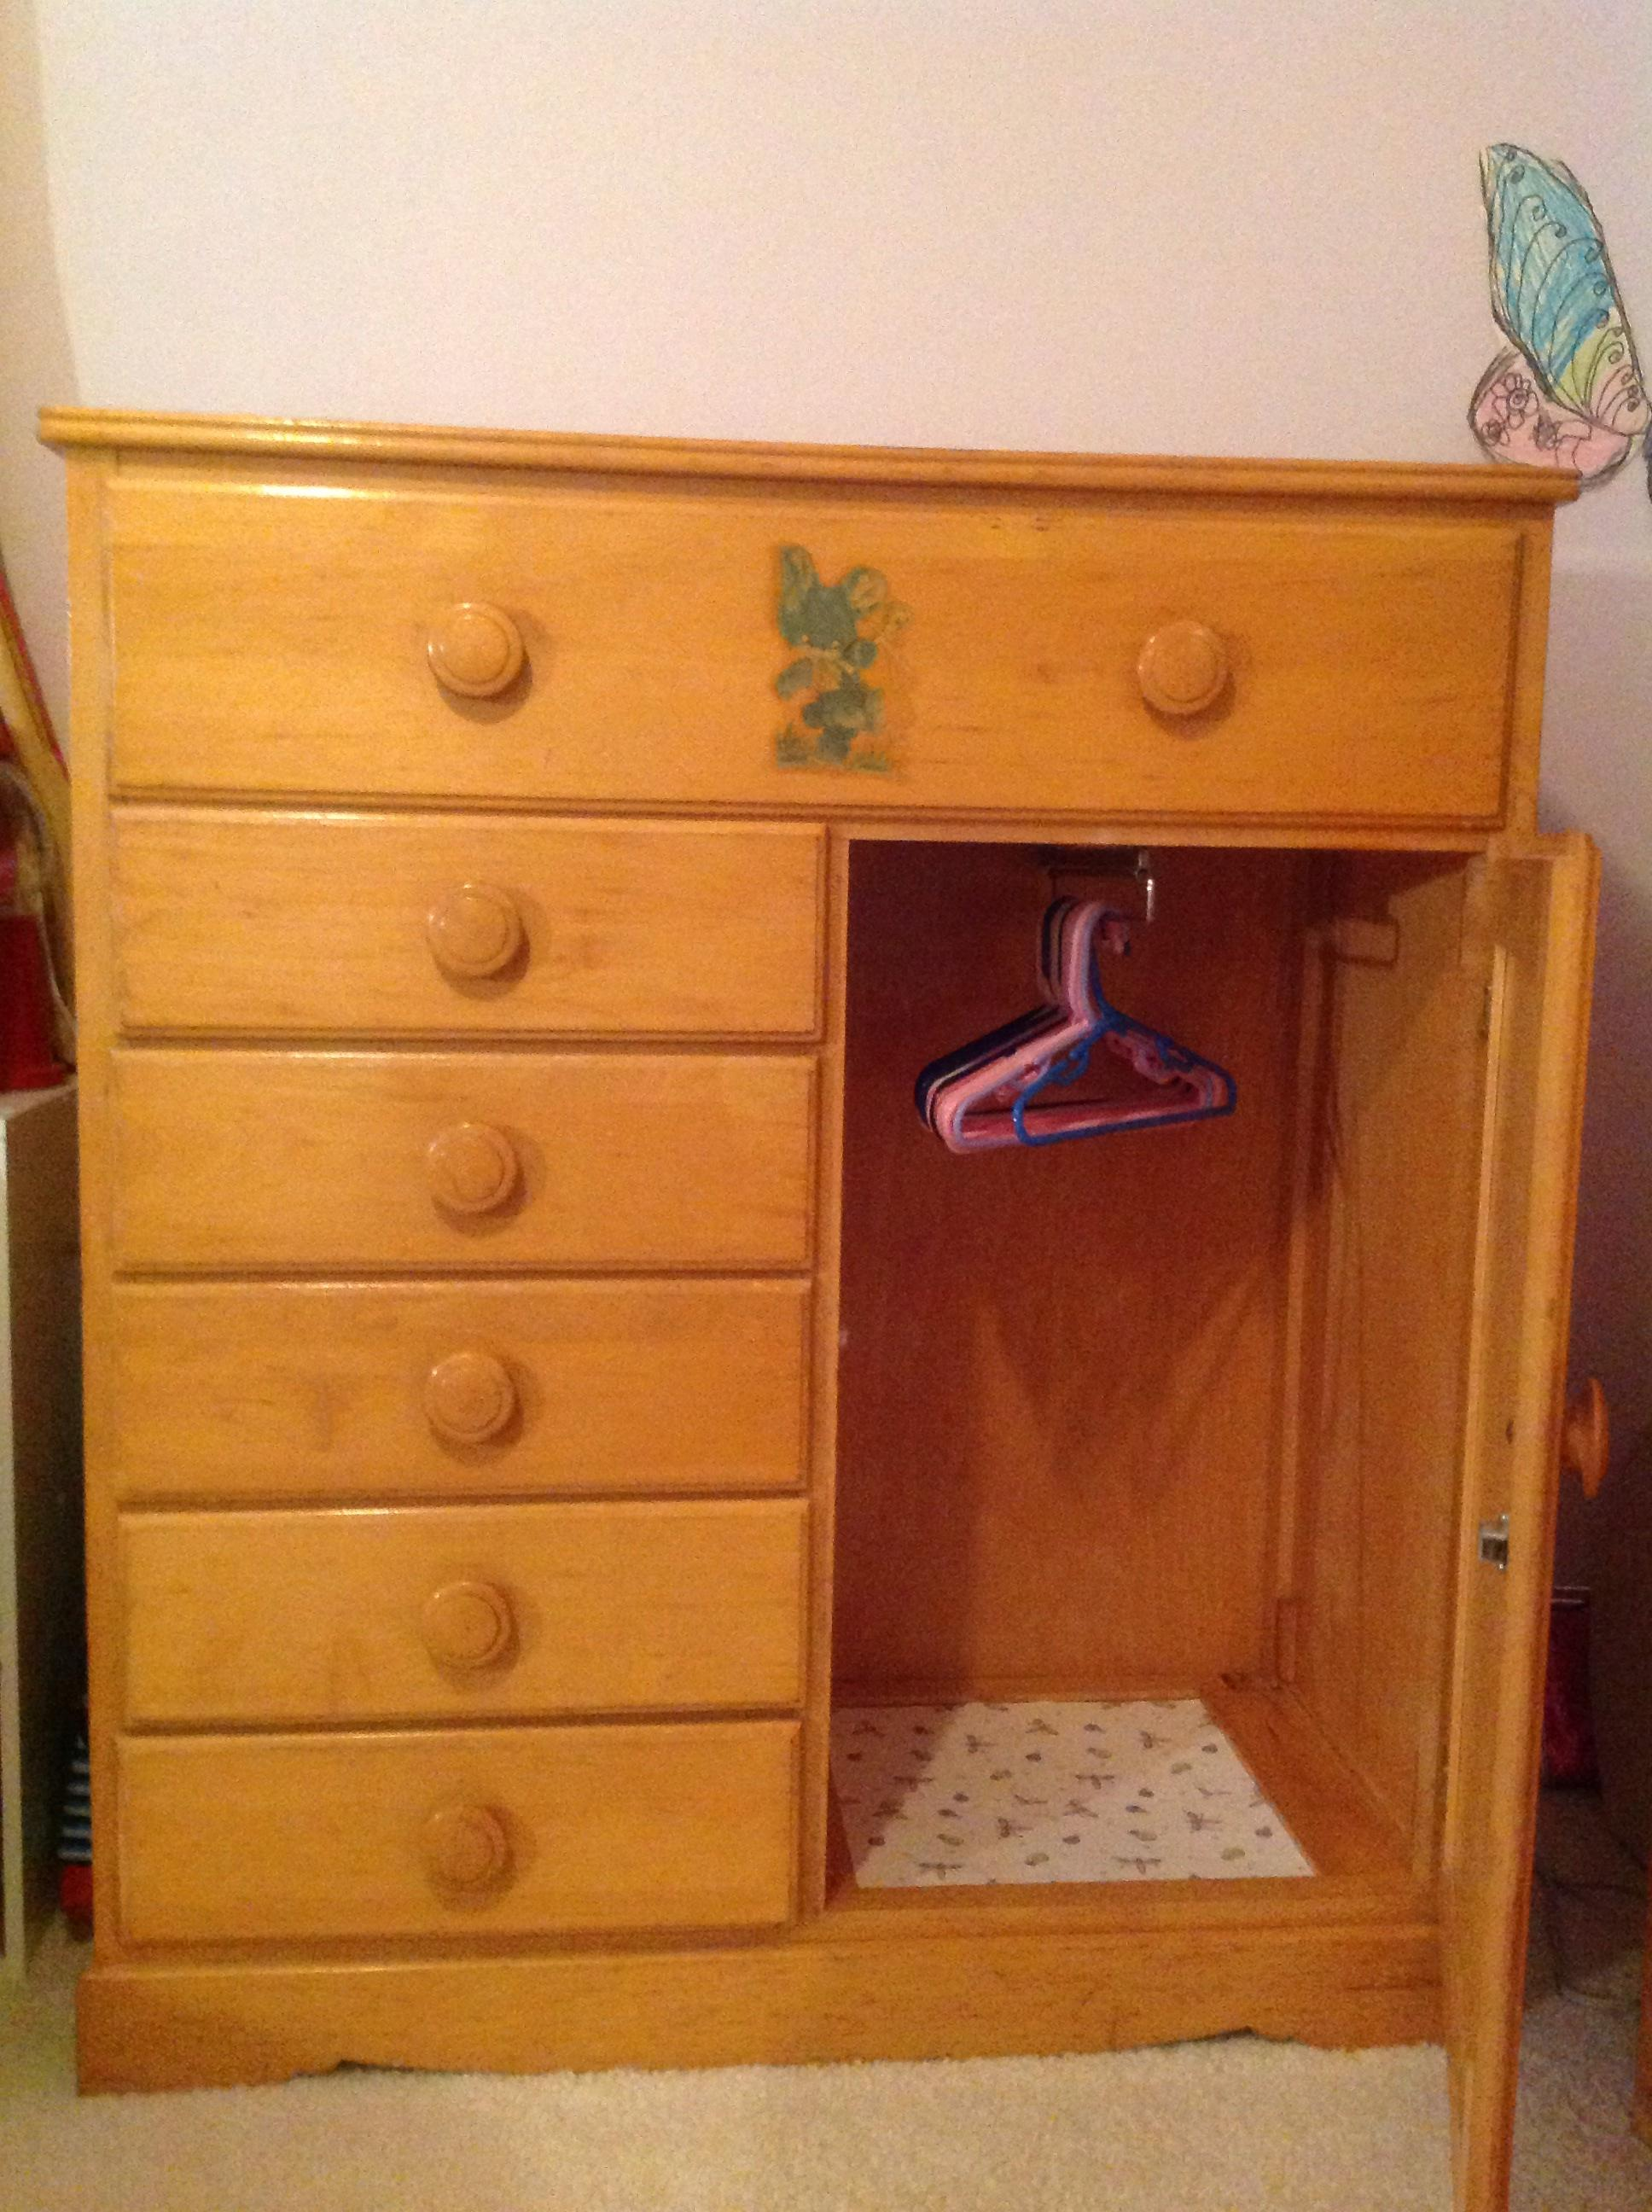 Antique Baby Furniture. Antique Baby Furniture antique appraisal   InstAppraisal